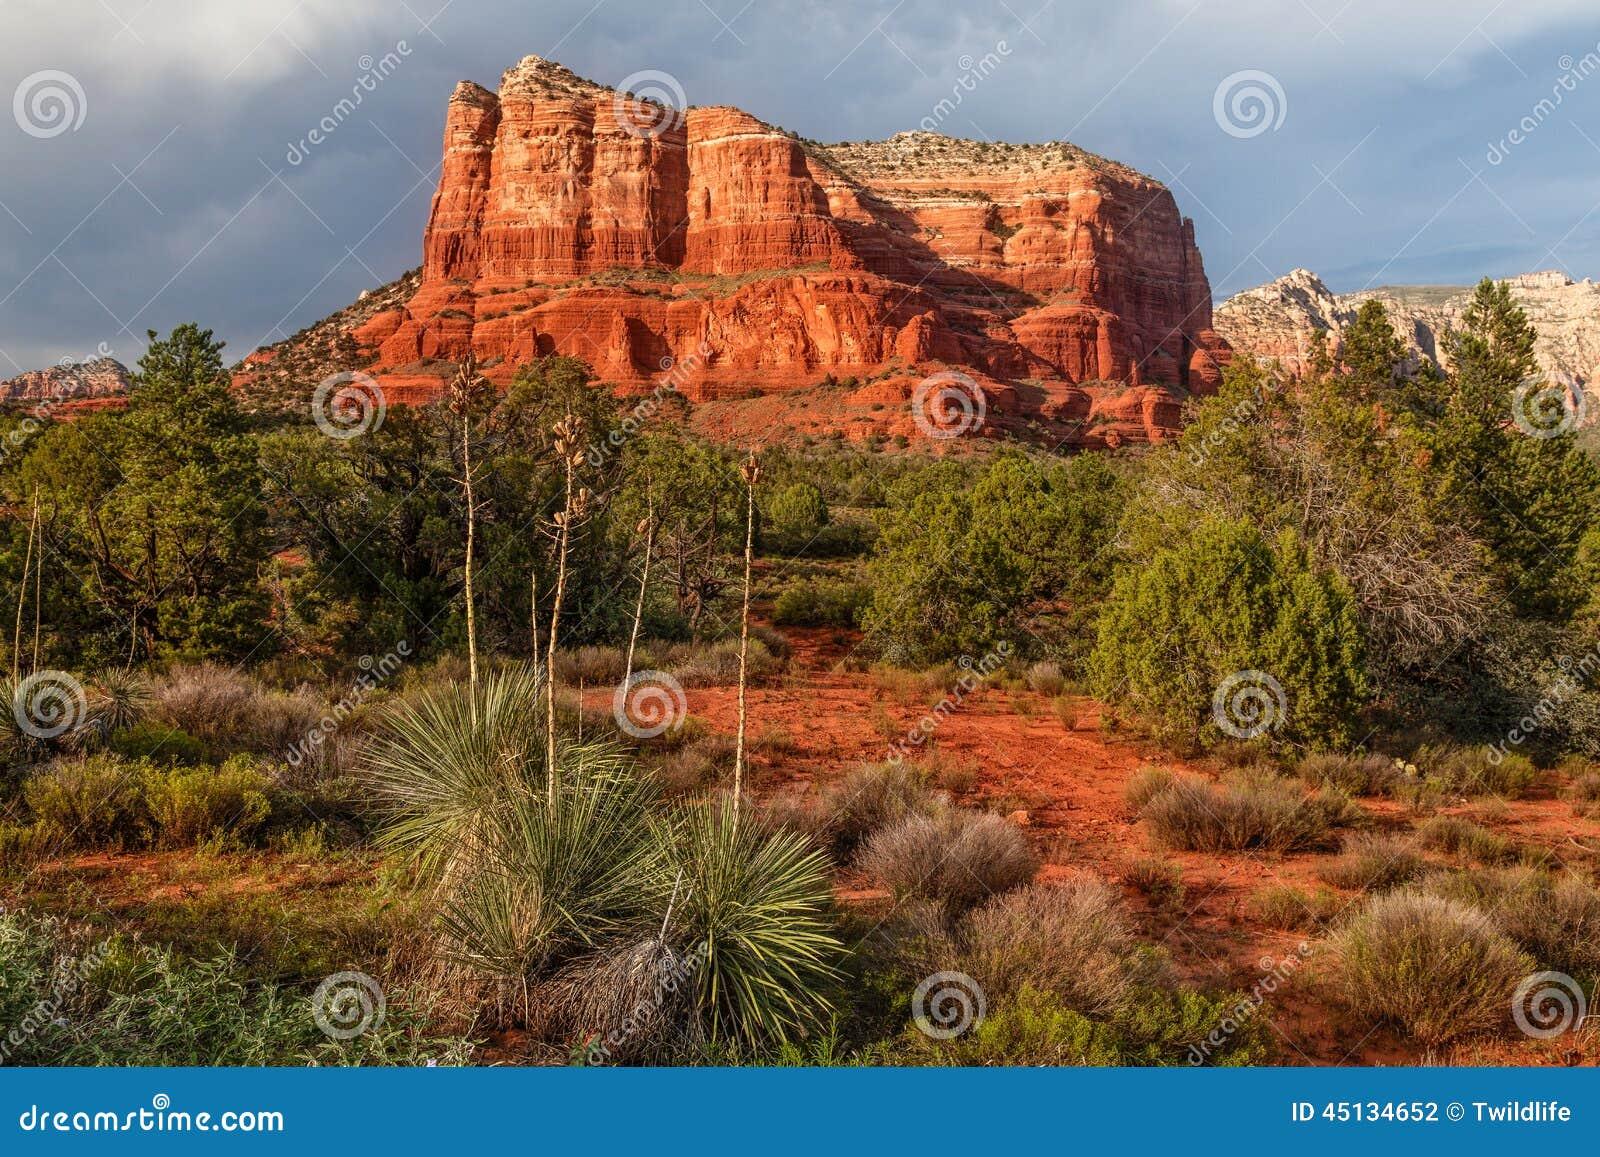 Gericht Butte Sedona Arizona